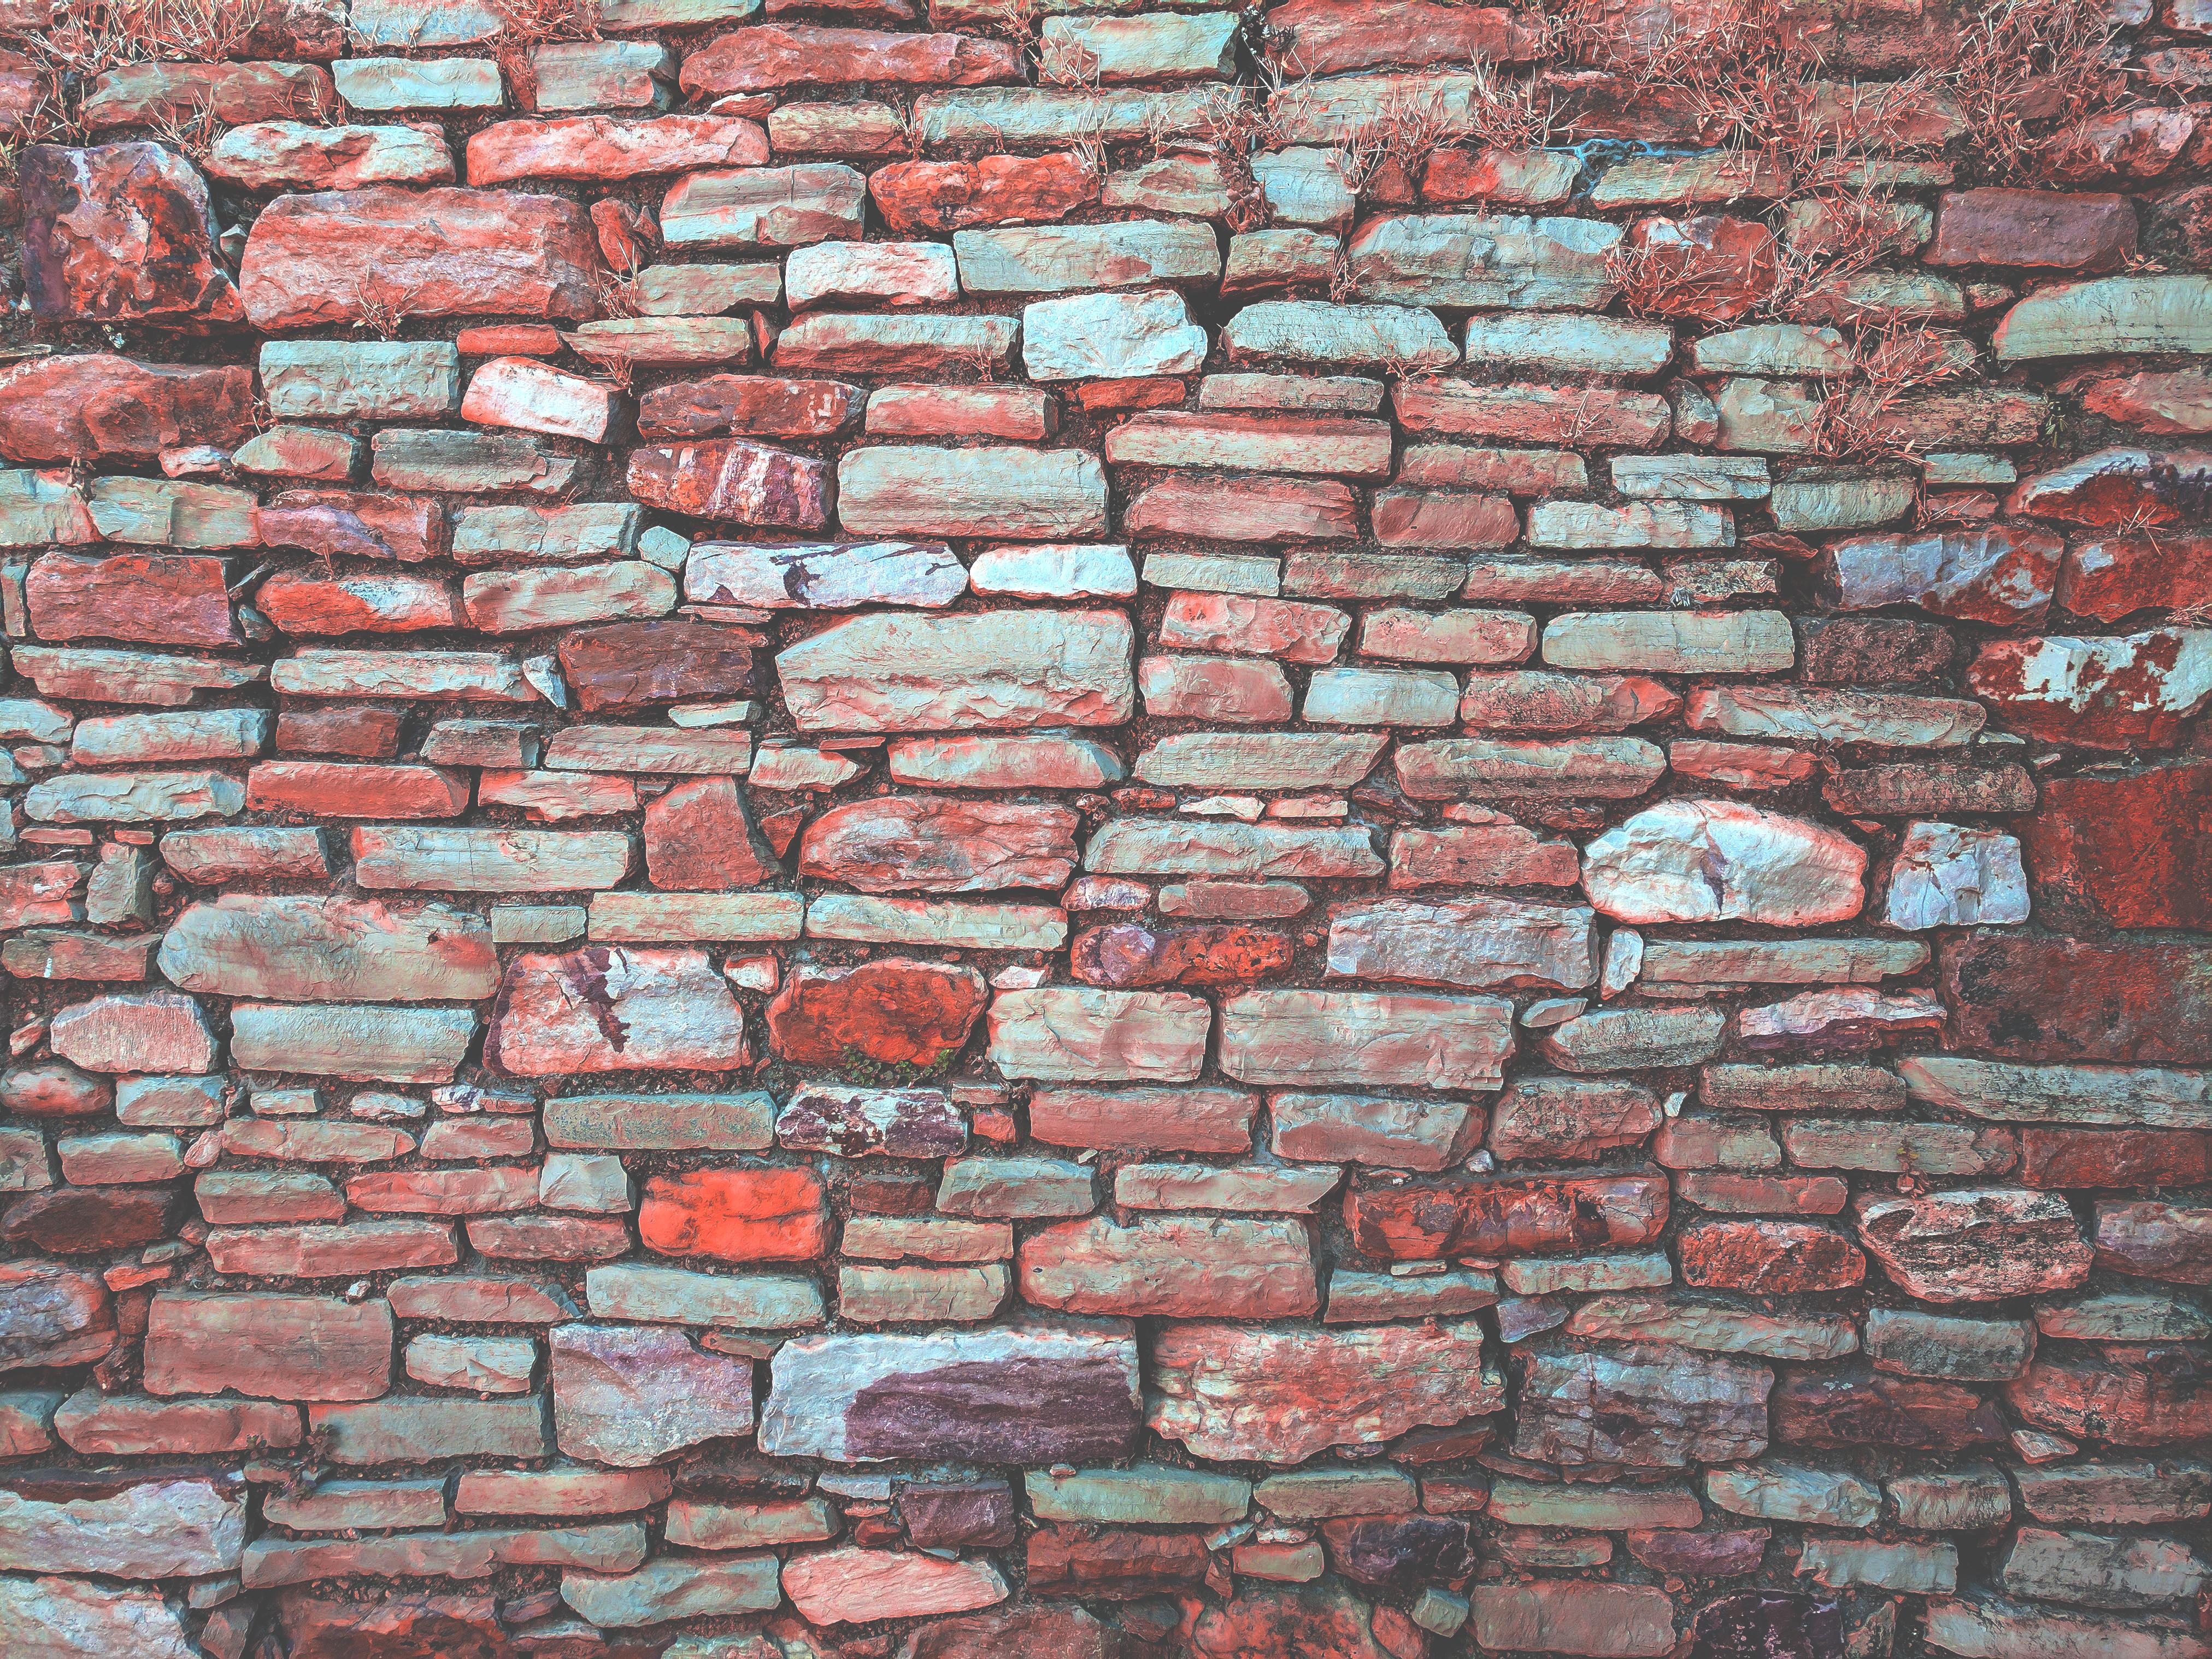 textura pared piedra pared de piedra ladrillo material bloquear ladrillos